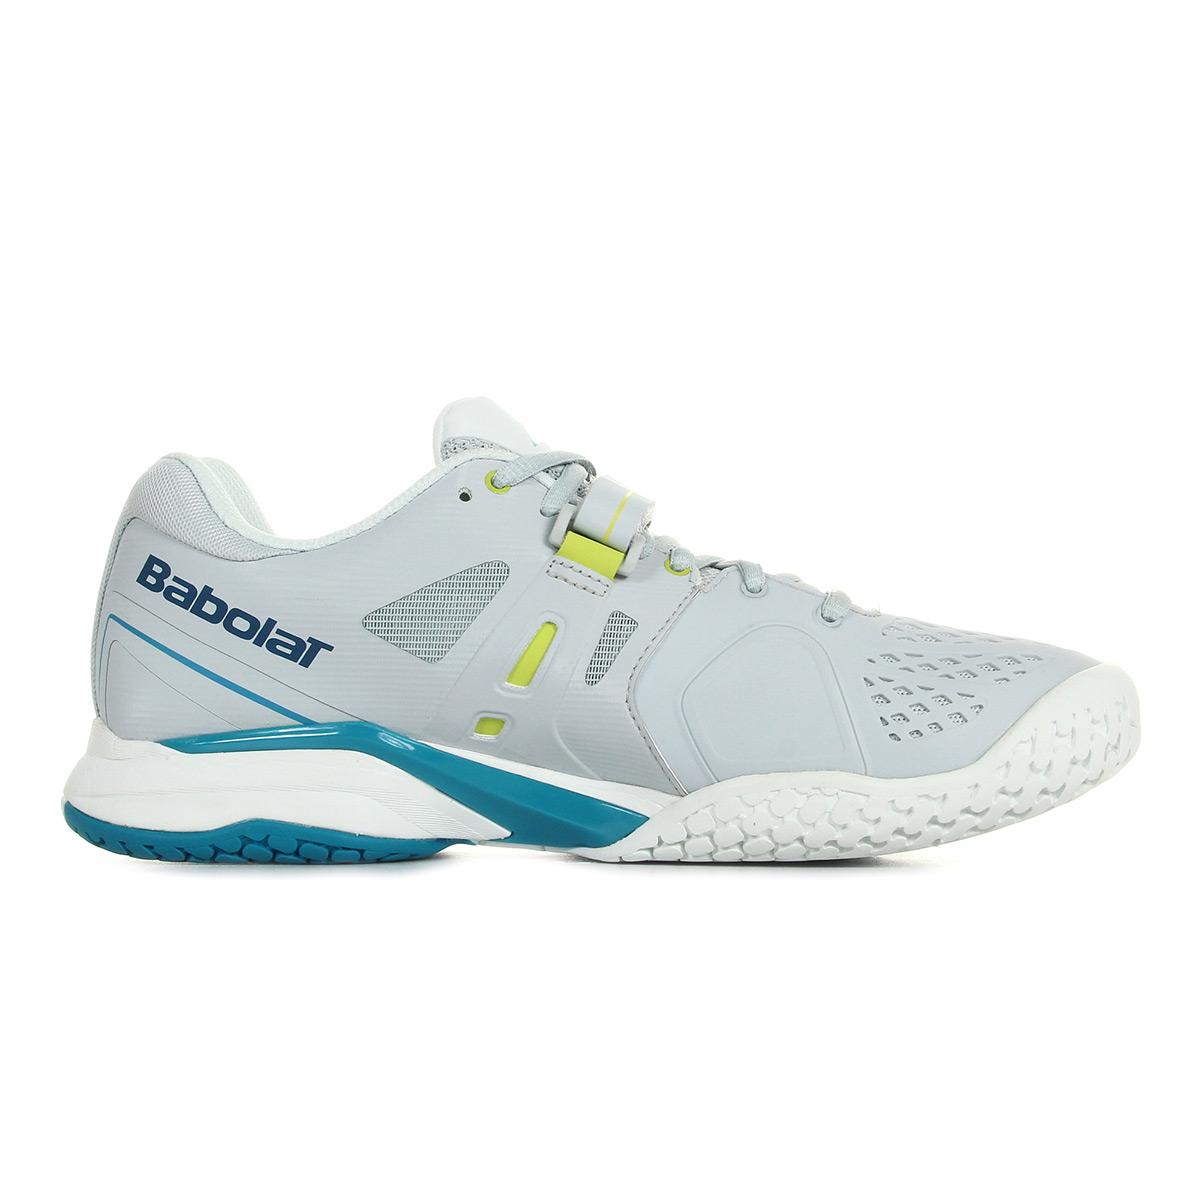 Babolat Propulse Bpm All court M 30S1572, Tennis